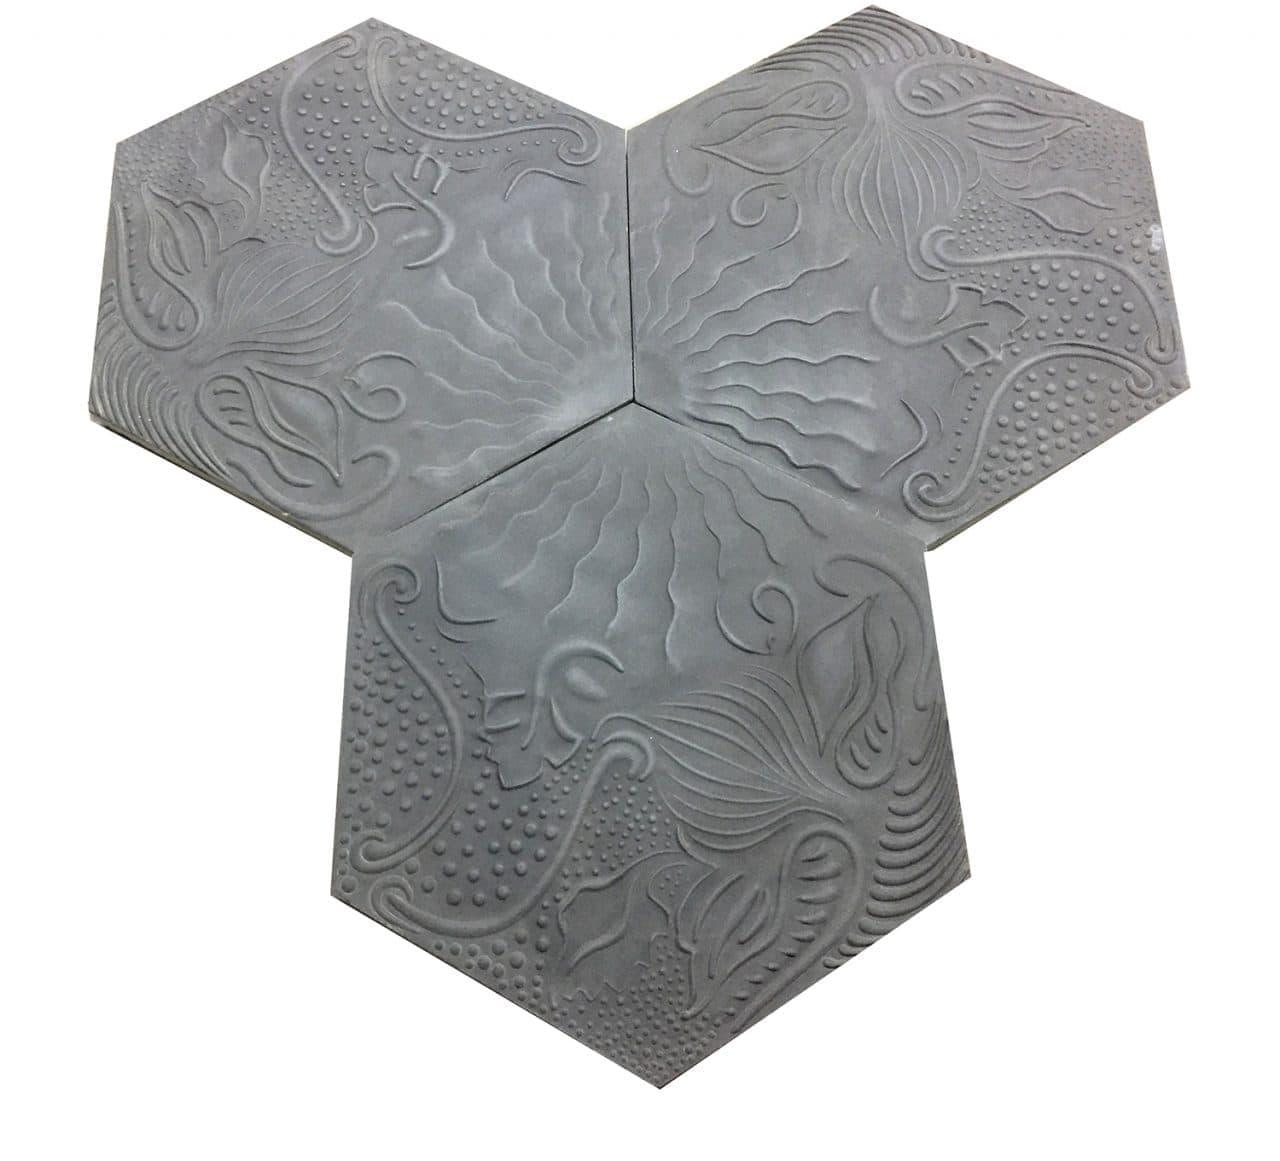 hexa gaudi 0005